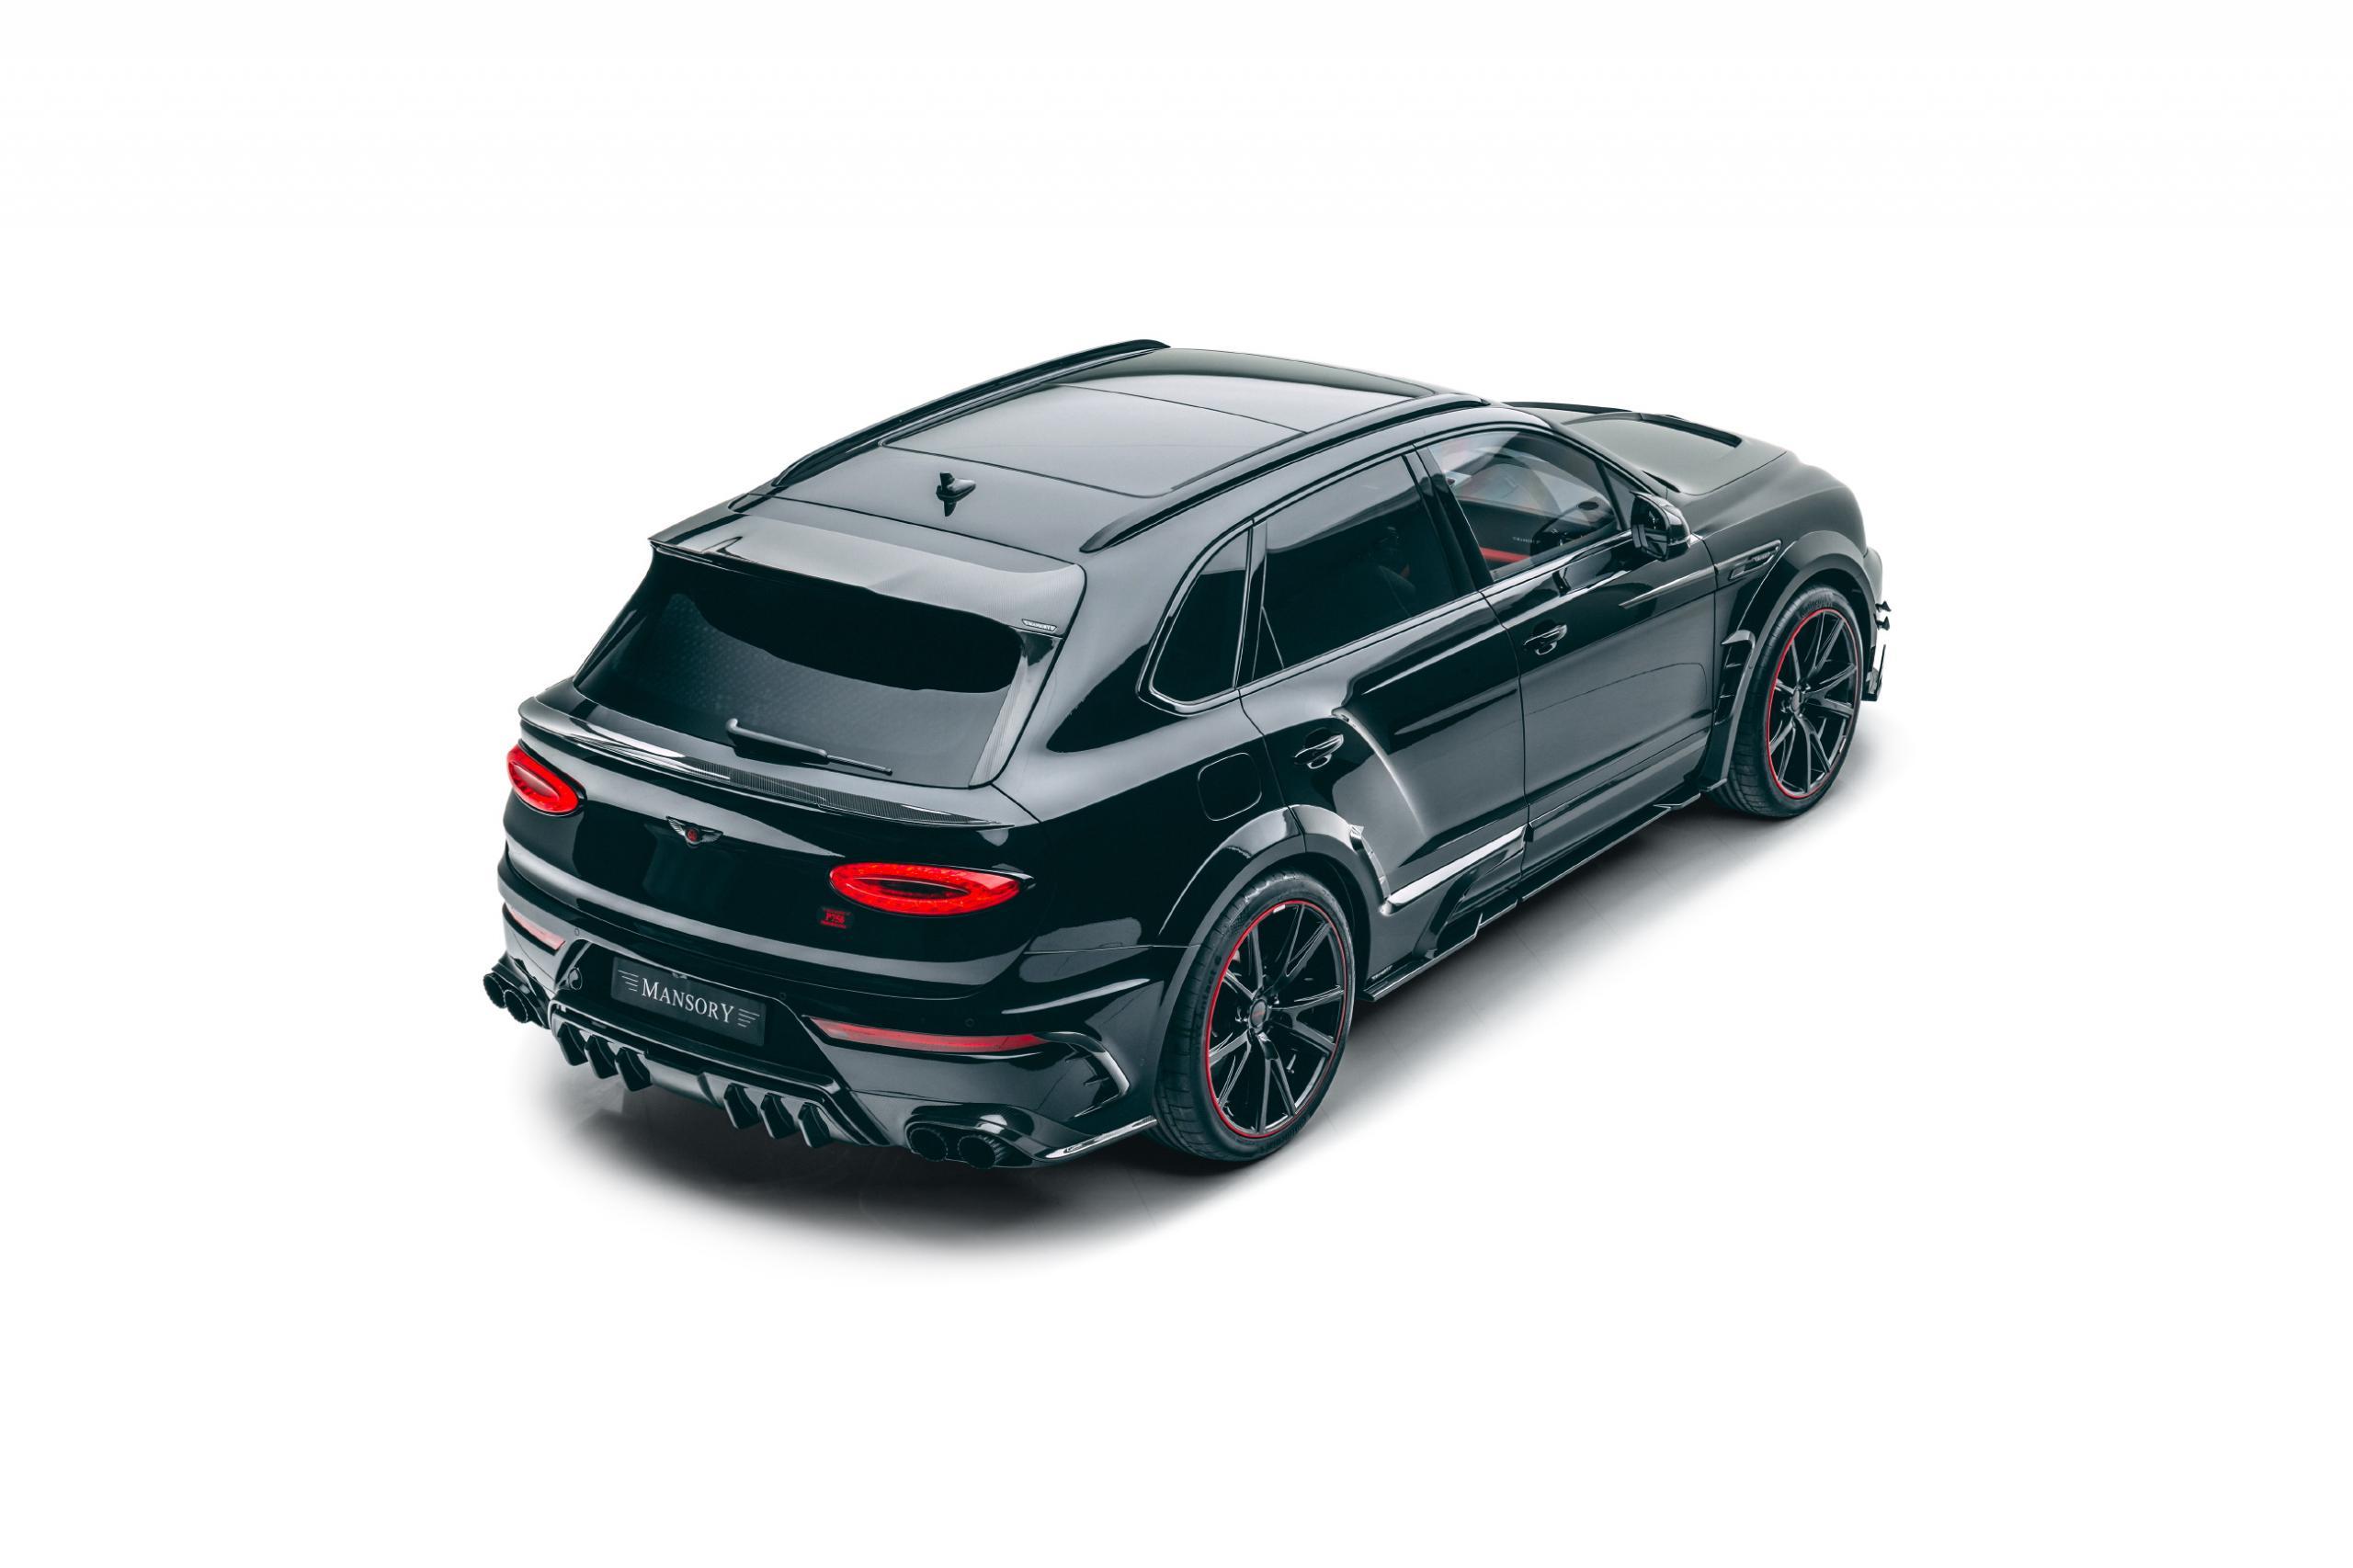 mansory new bentayga wide body kit carbon fiber rear bumper roof spoiler y.5 23 wheel 2021